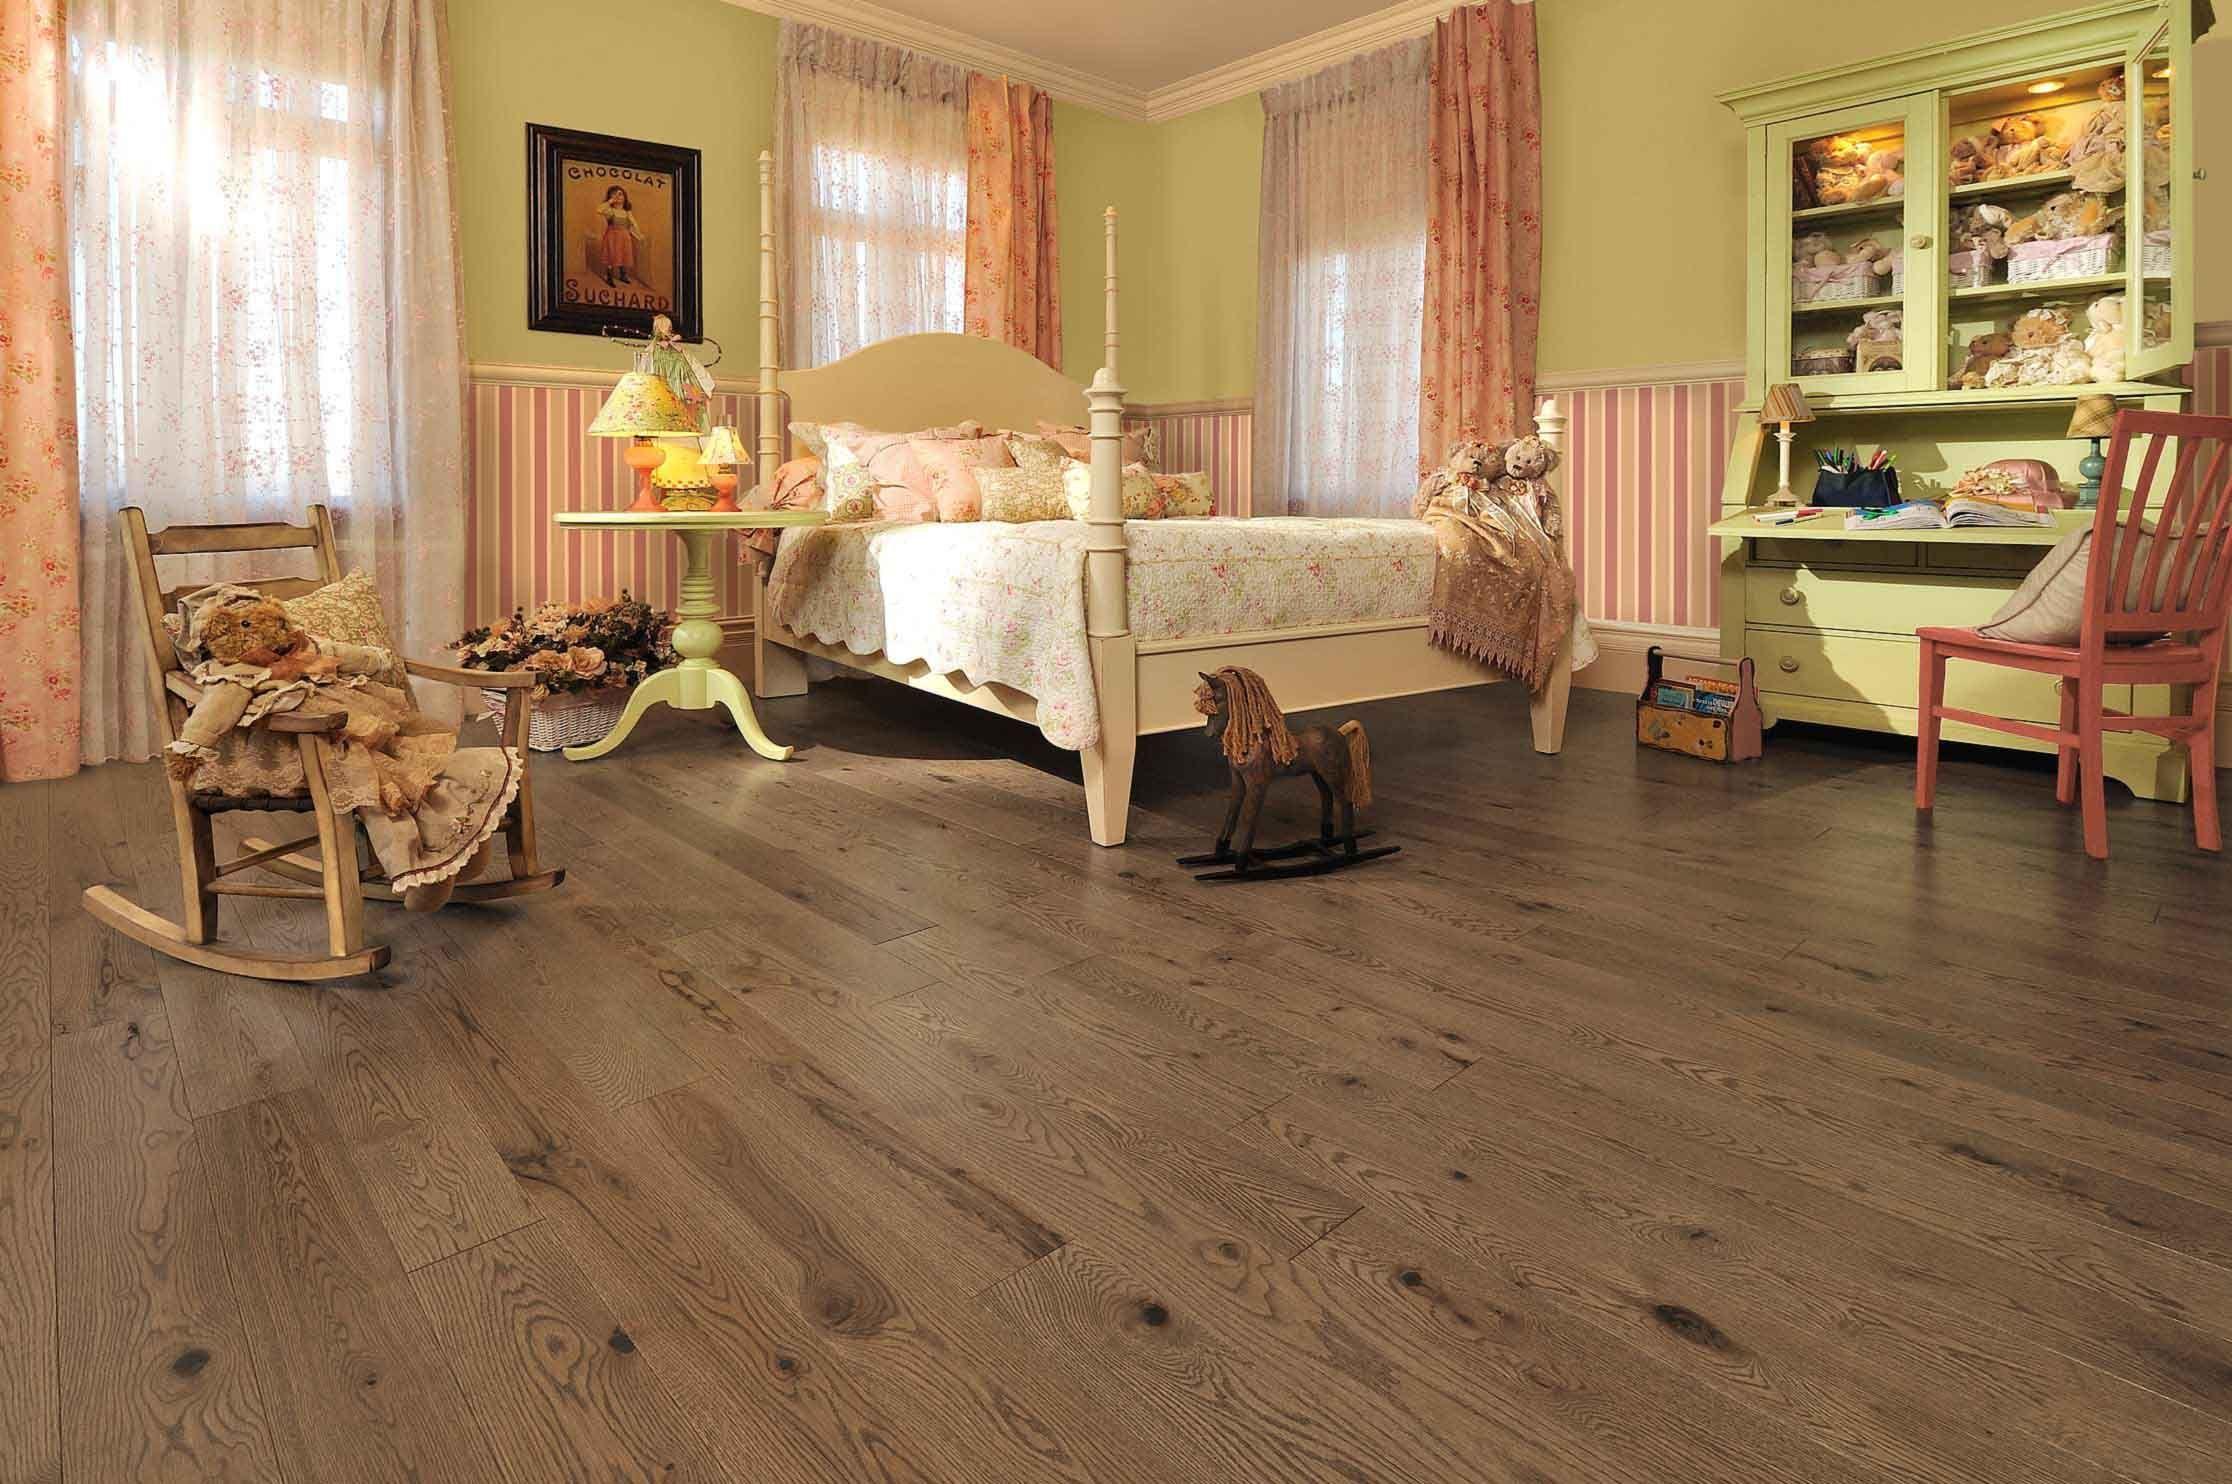 Red Oak Bedroom Furniture Handcrafted Red Oak Teddy Bear Mirage Hardwood Floors